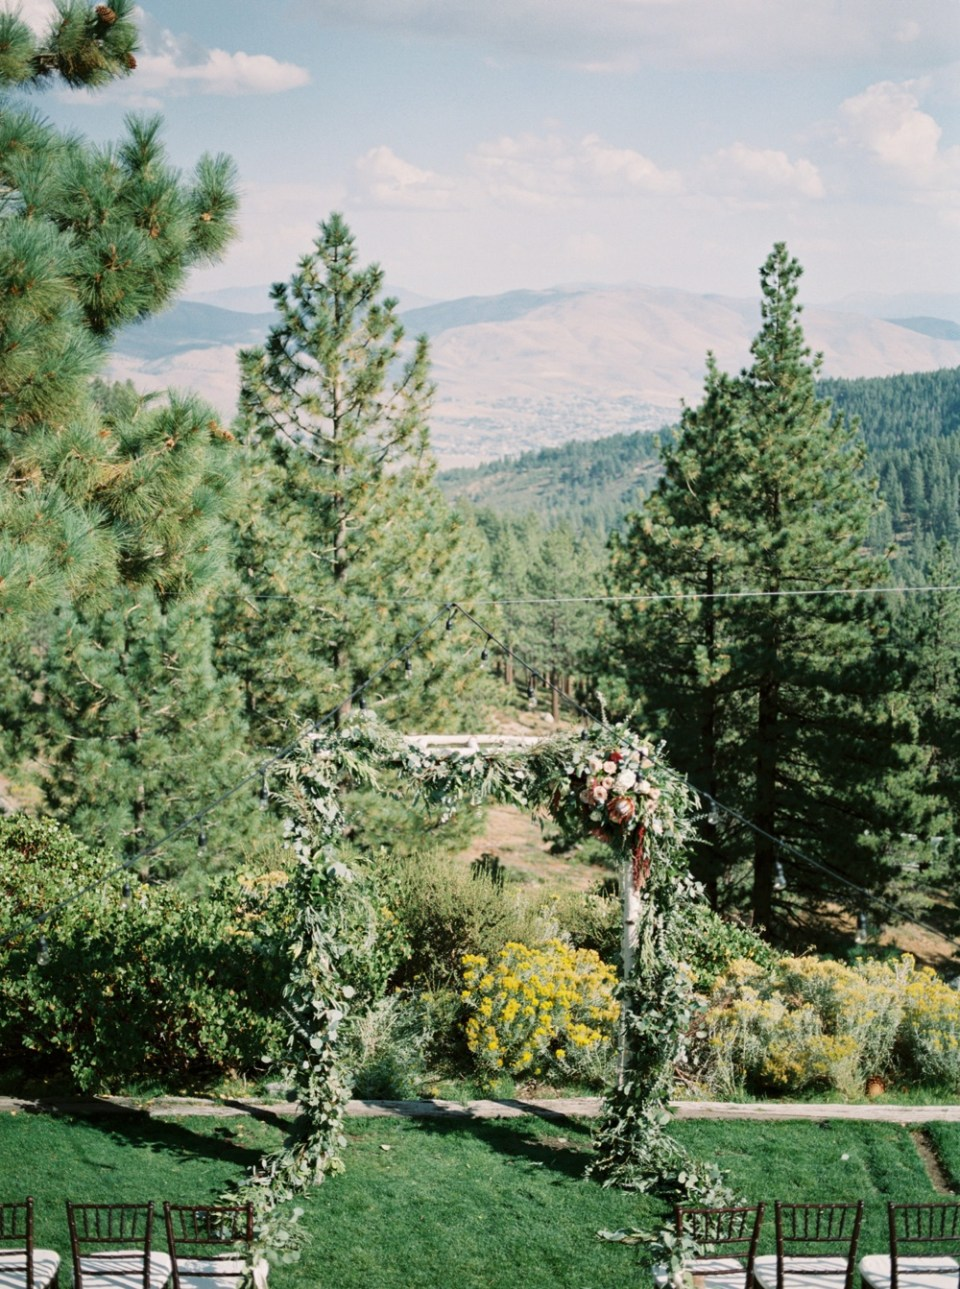 ceremony balcony lake tahoe wedding venue, mountain wedding inspiration tannenbaum